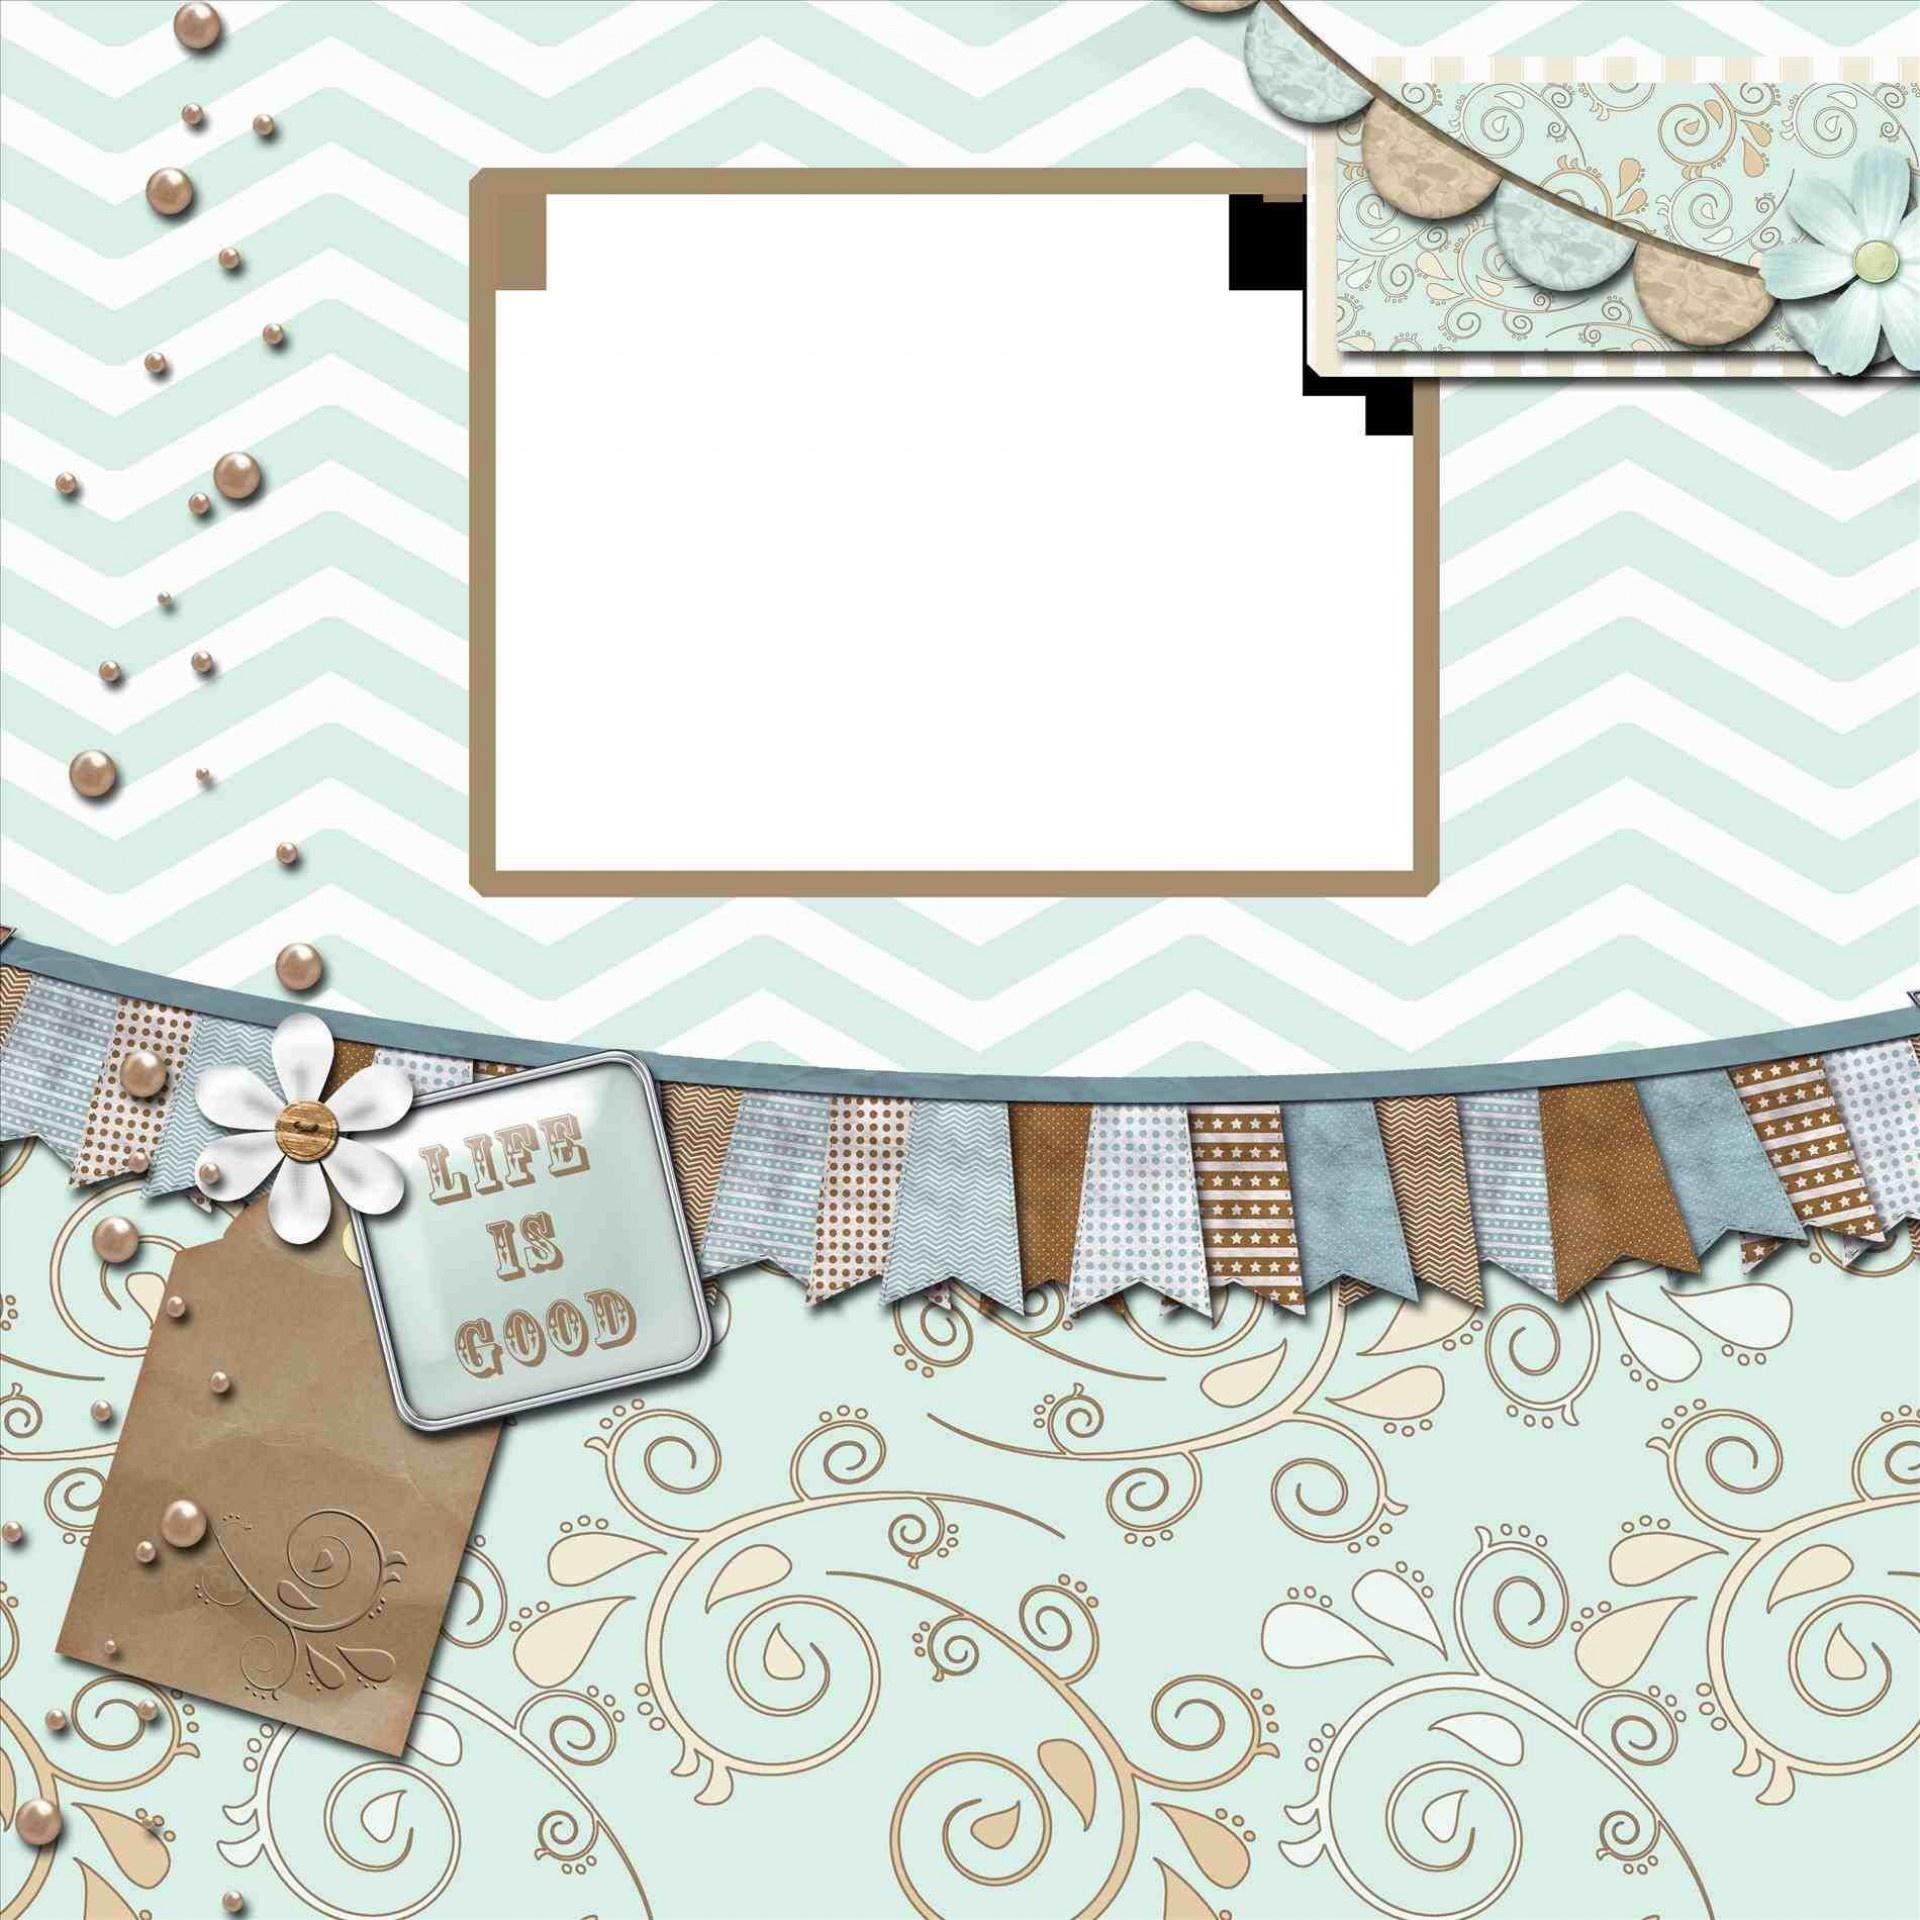 004 Template Ideas Best Scrapbook Templates Online Of Free Printable - Free Printable Scrapbook Pages Online